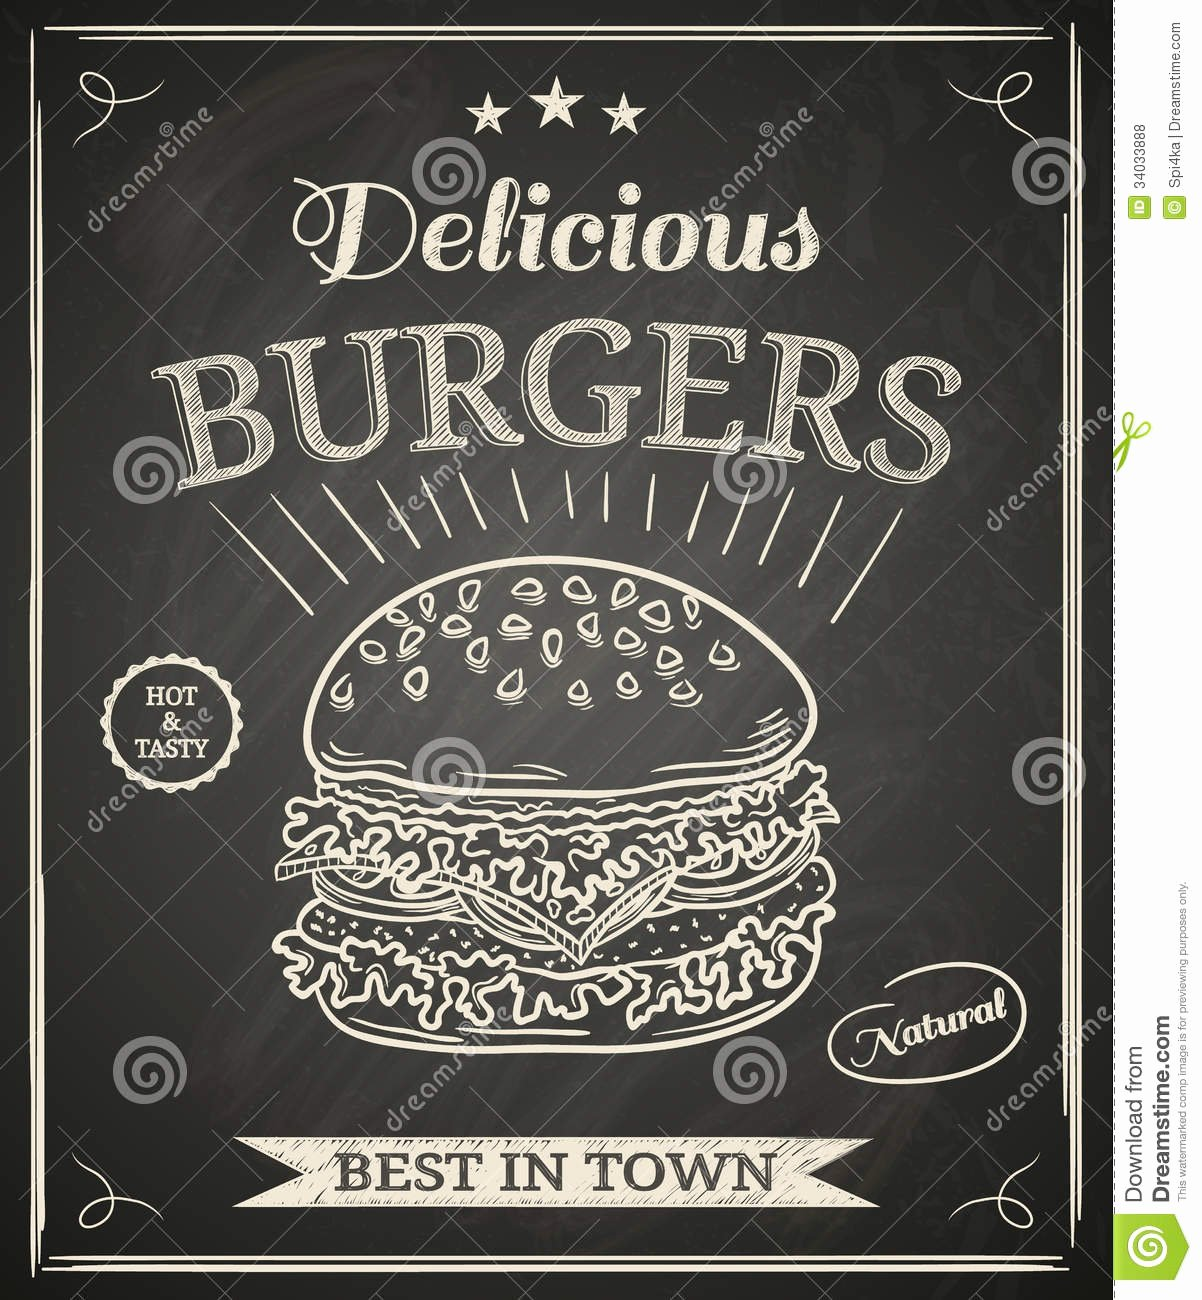 Burger Poster Royalty Free Stock S Image